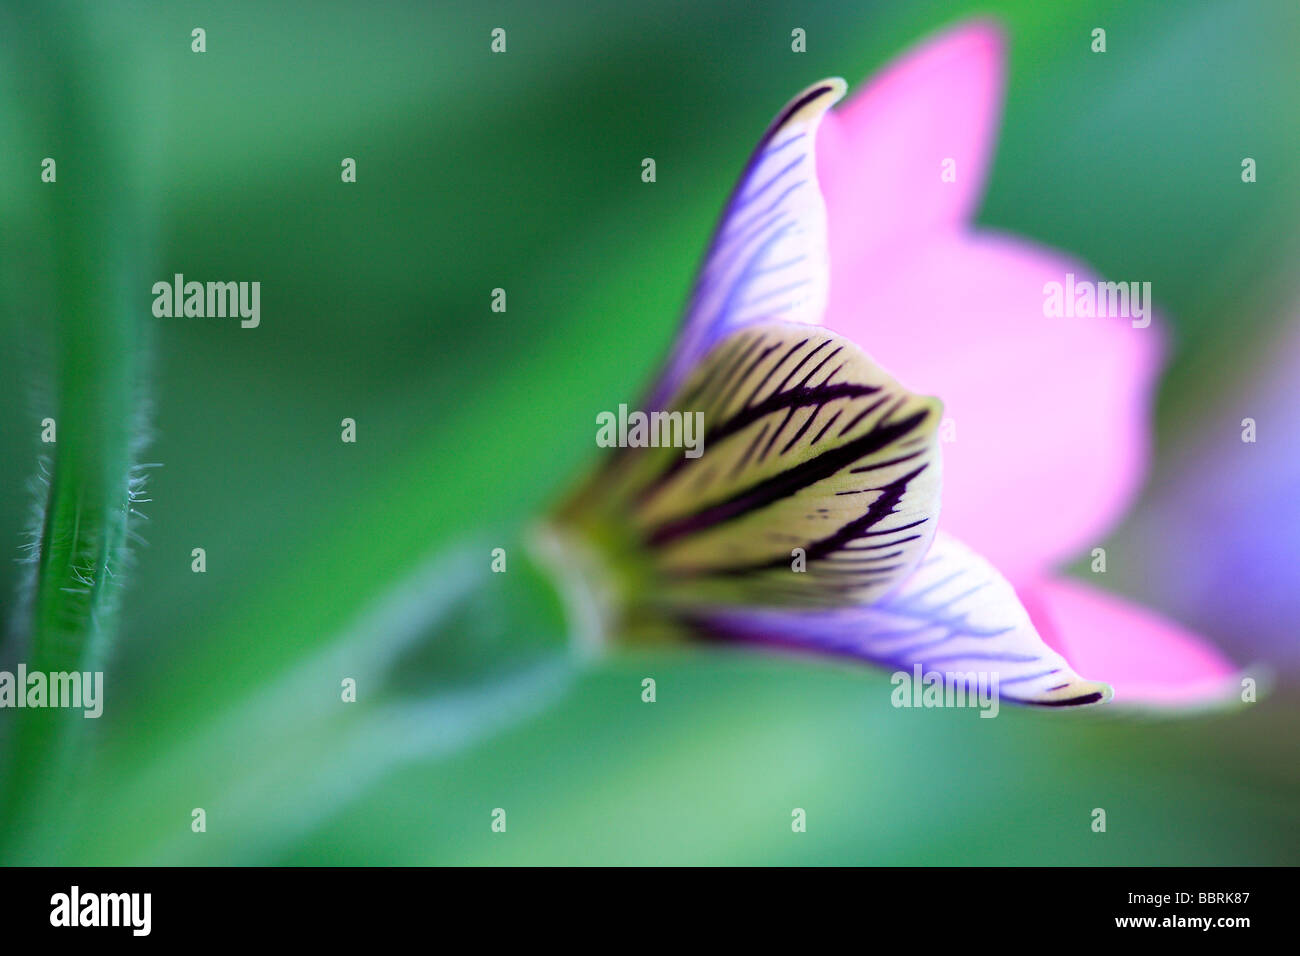 Sabbia crocus Romulea fiore tetragonale Inghilterra molla Immagini Stock